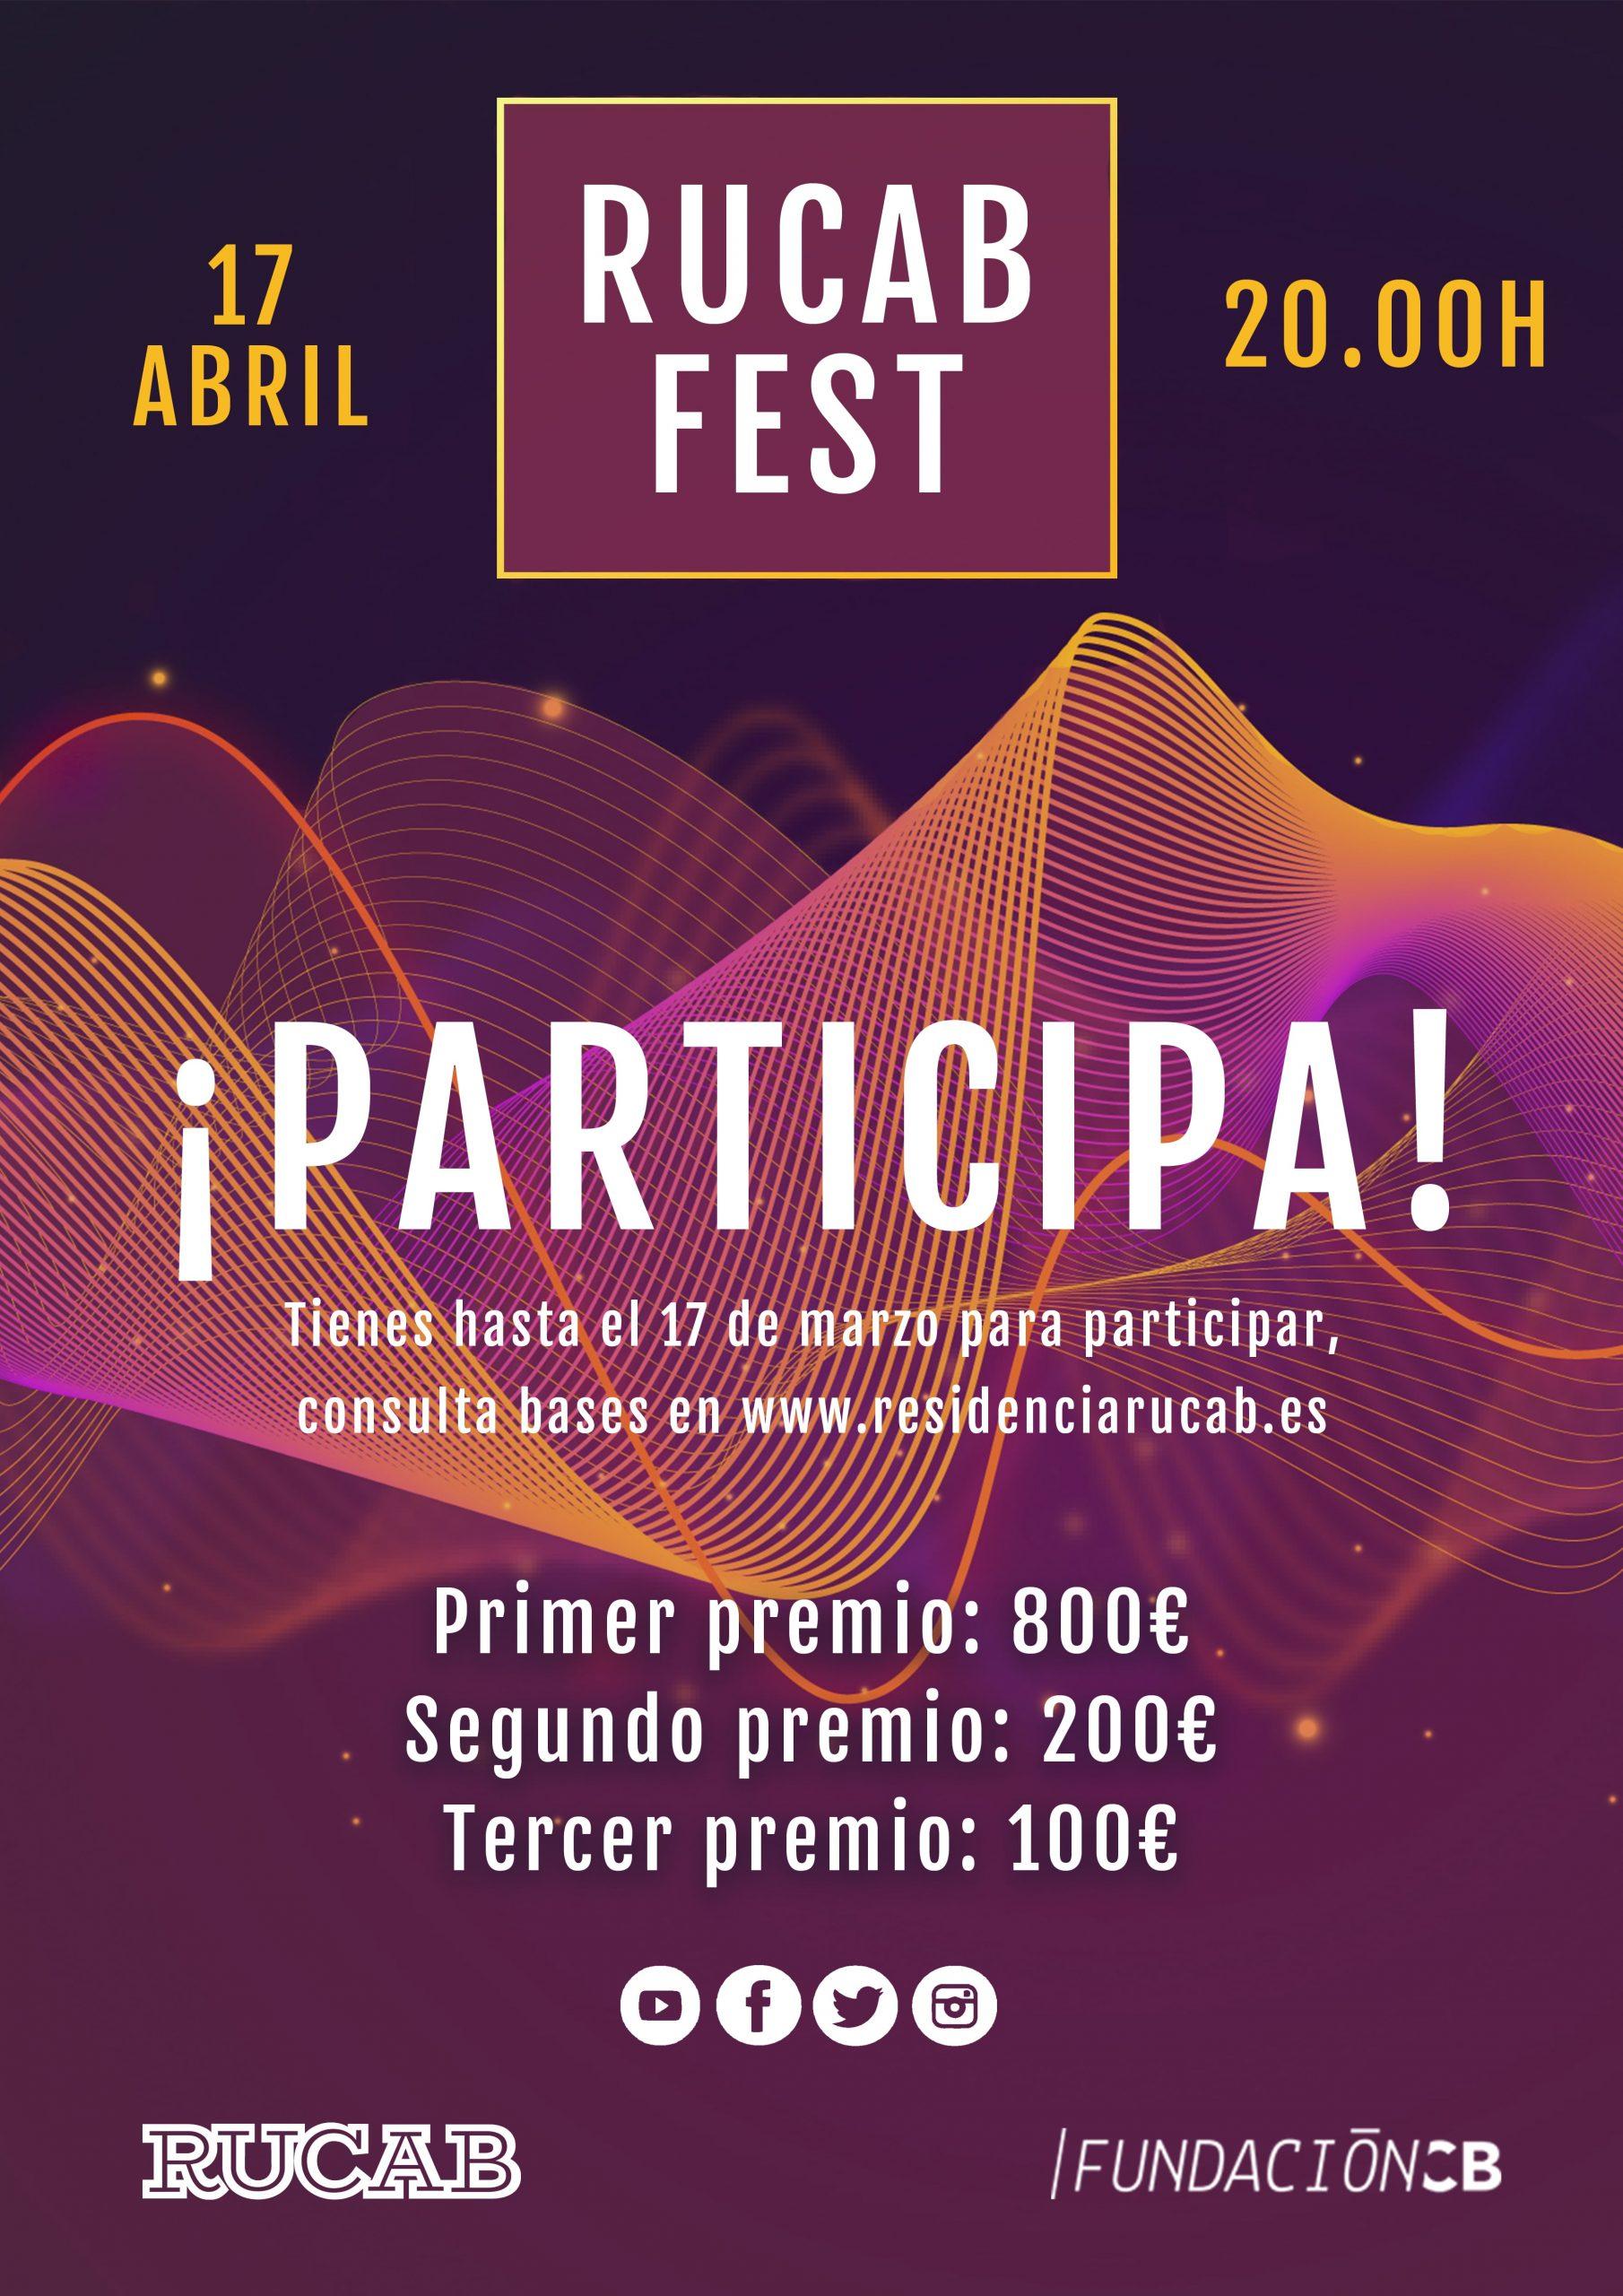 Cartel RUCAB FEST